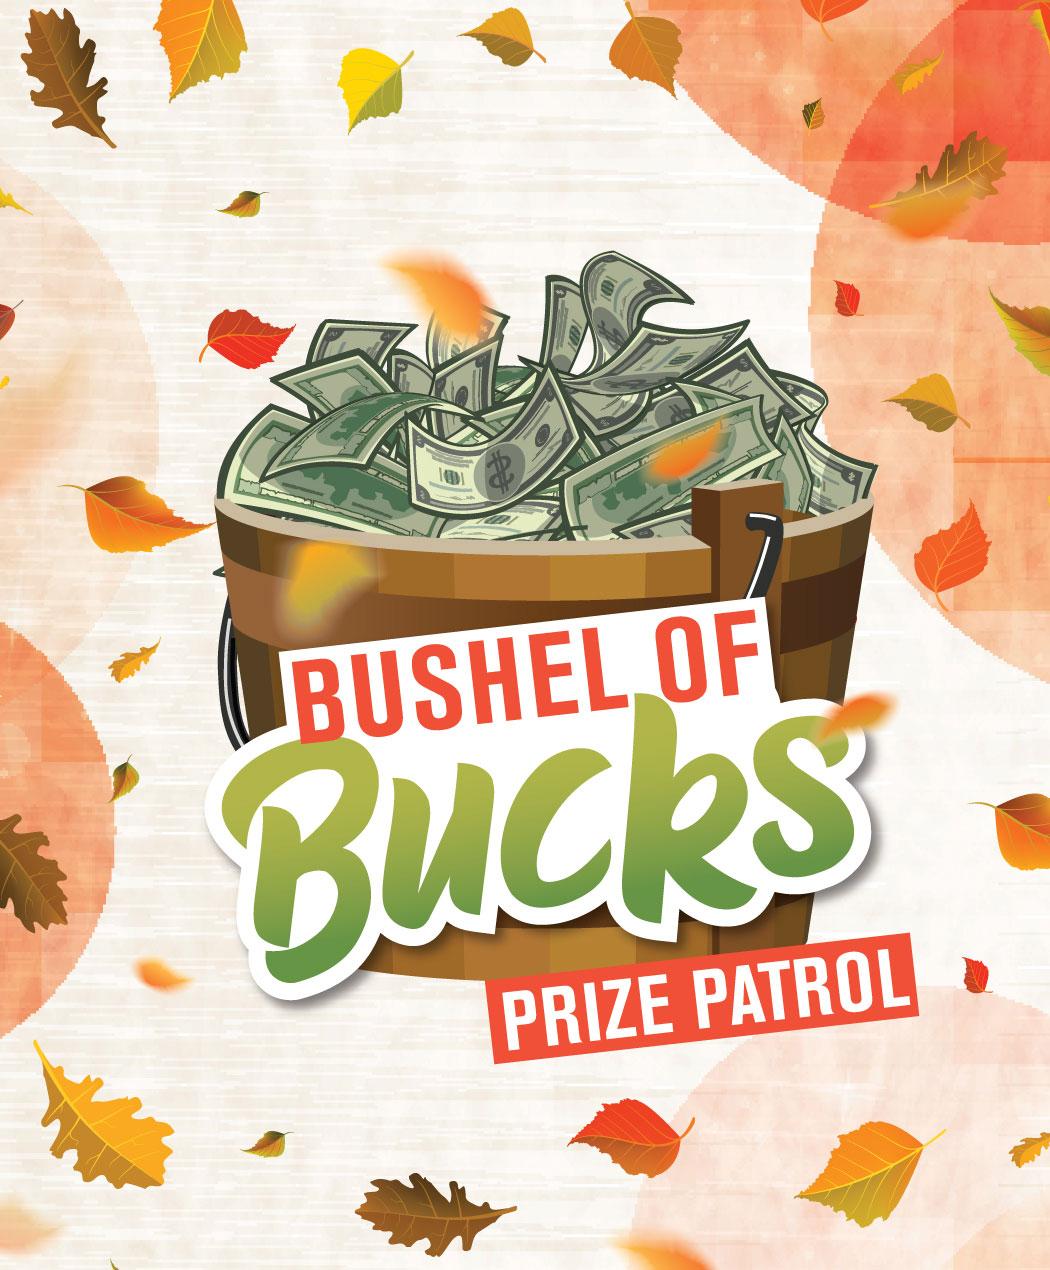 Bushel of Bucks